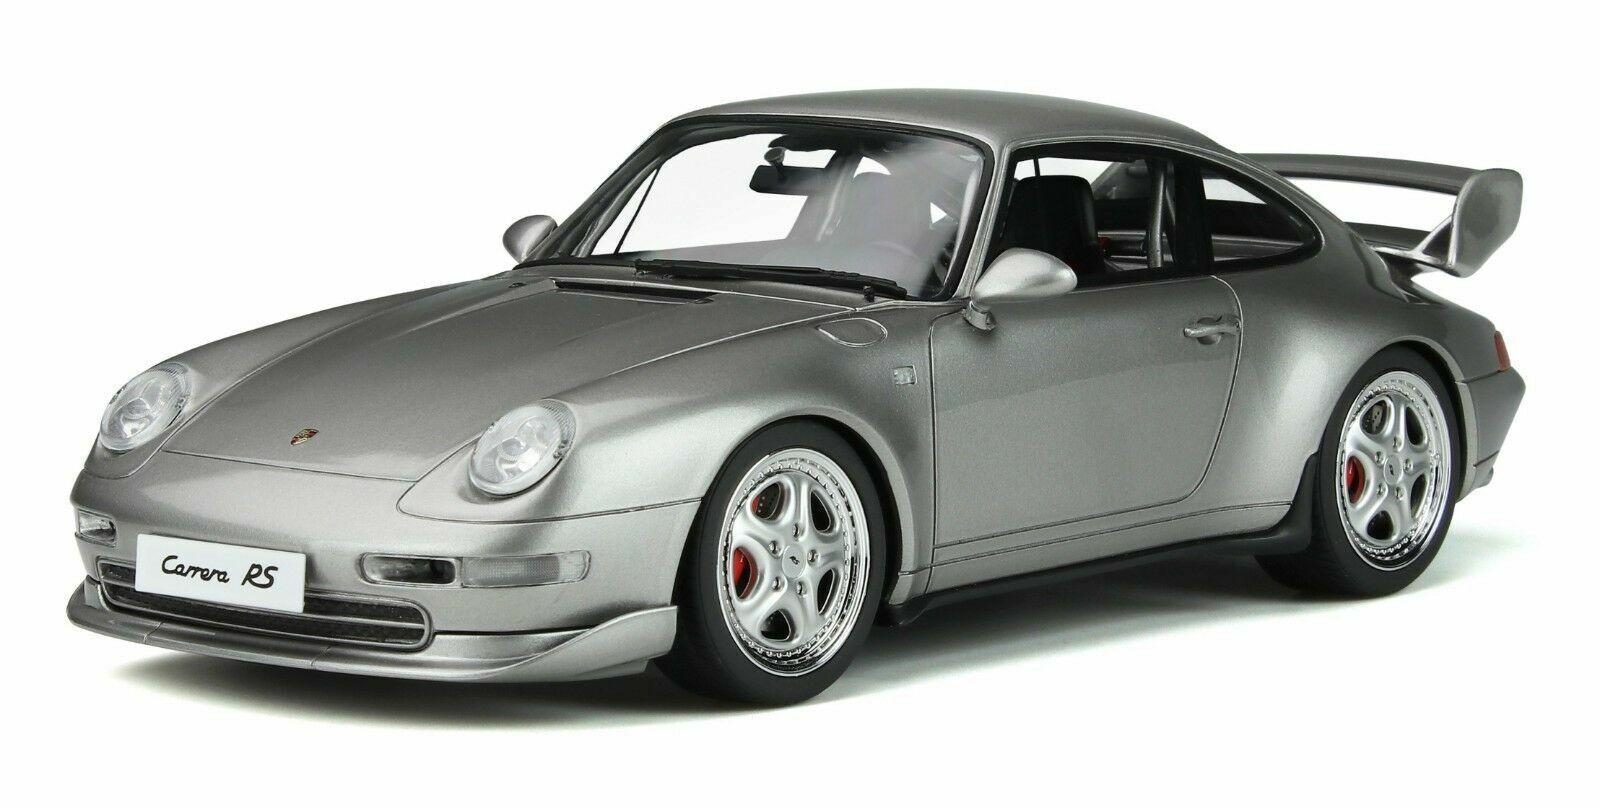 GT SPIRIT  Porsche 911 (993) voitureRERA RS CLUB SPORT   1995  Limited  1 18  magasins d'usine